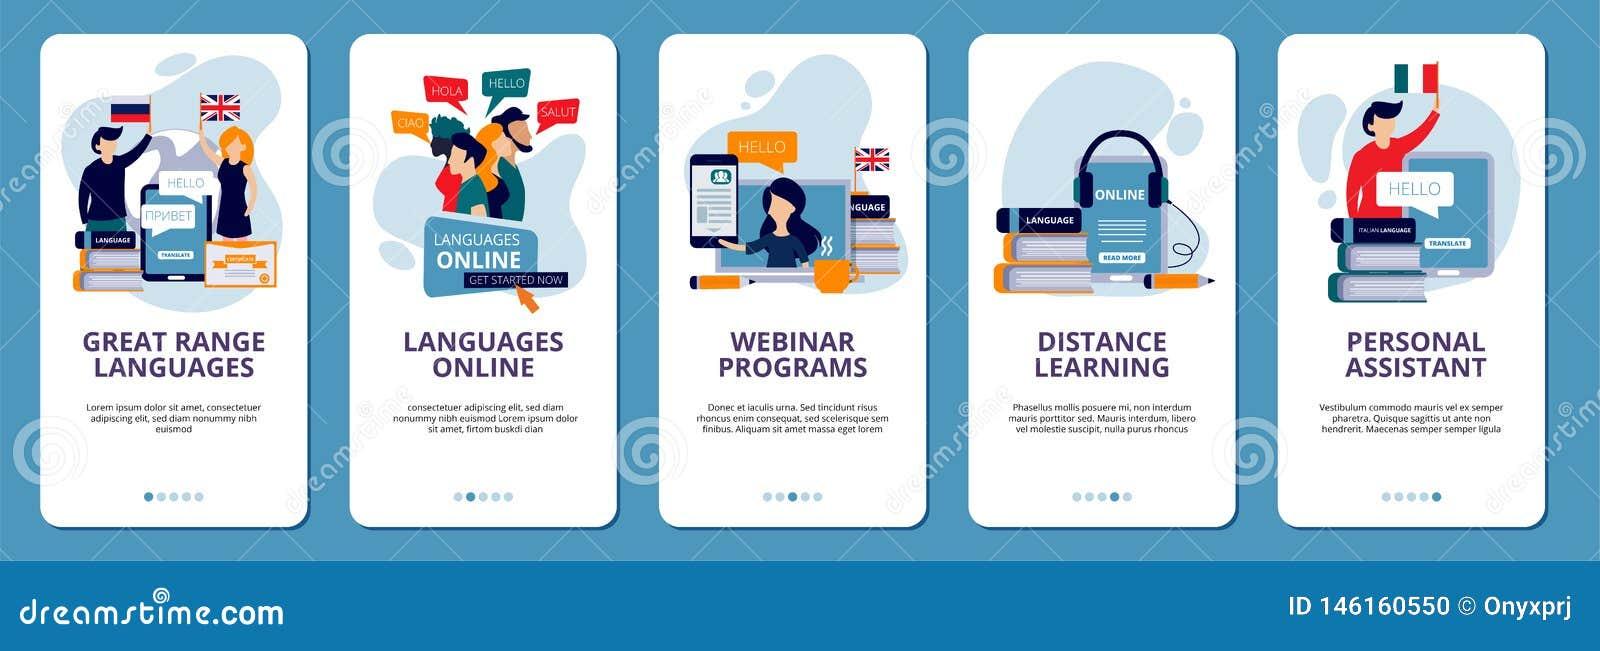 Onboarding Screens  Language Learning School Online Distance